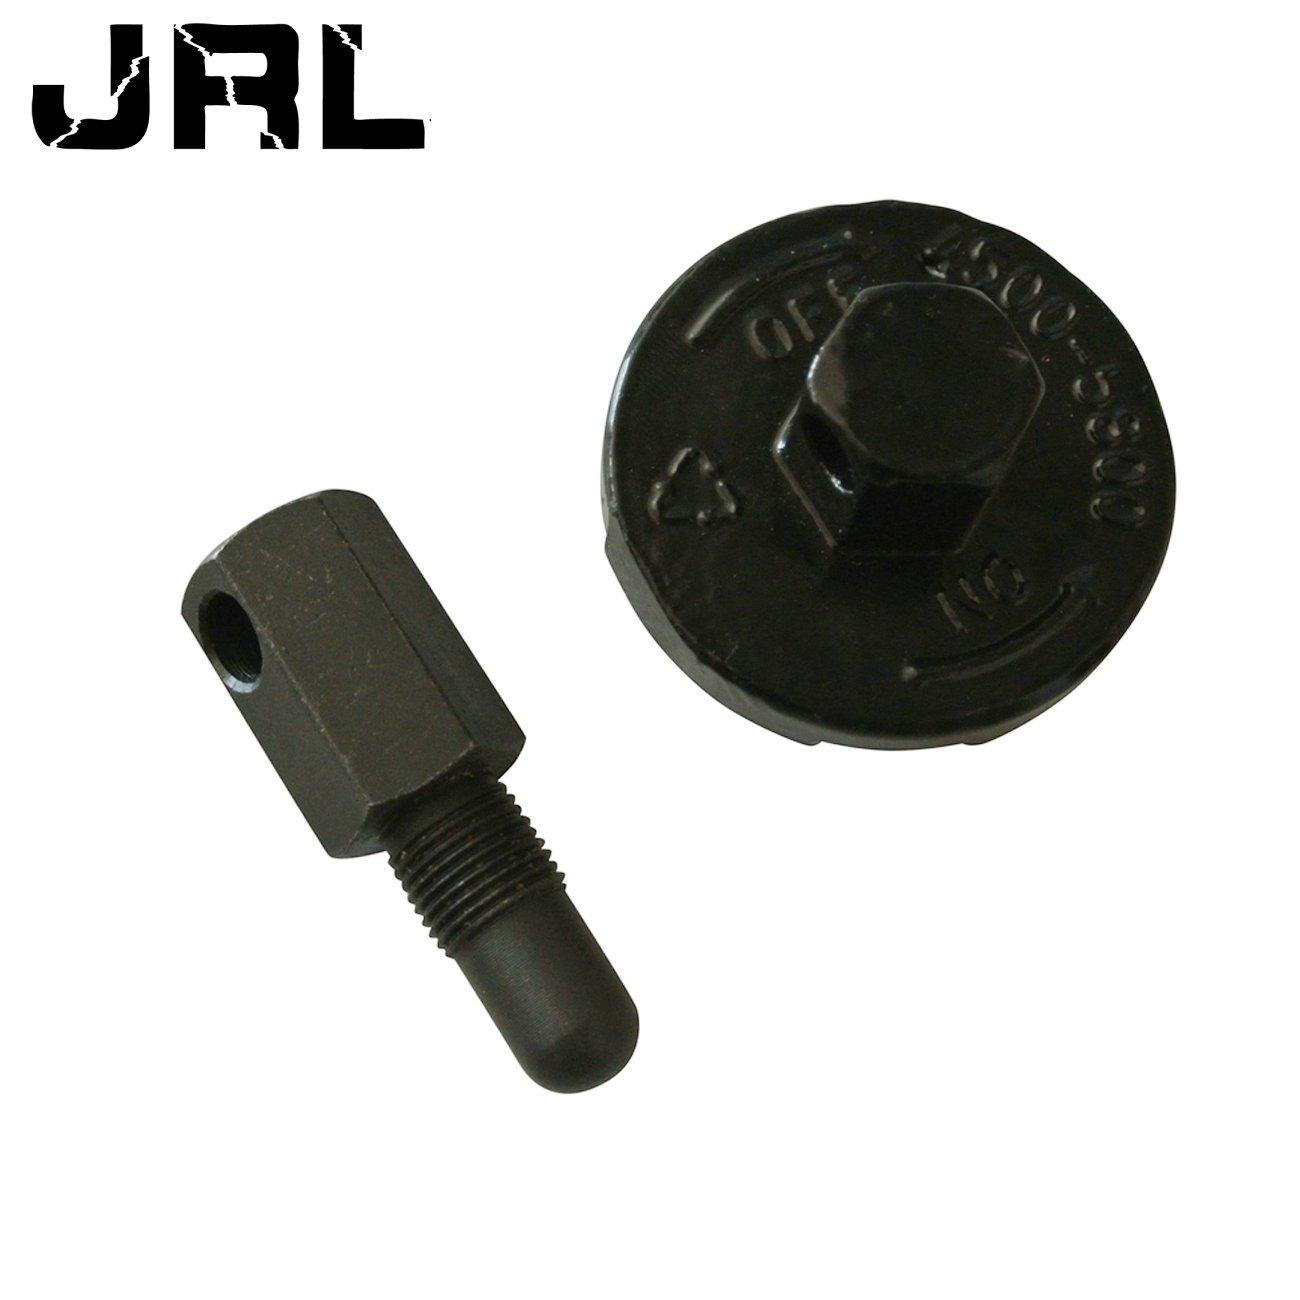 JRL Piston Stop Clutch Flywheel Removal Tools For Husqvarna Stihl 2 Cycle 14mm Kanglai Machinery